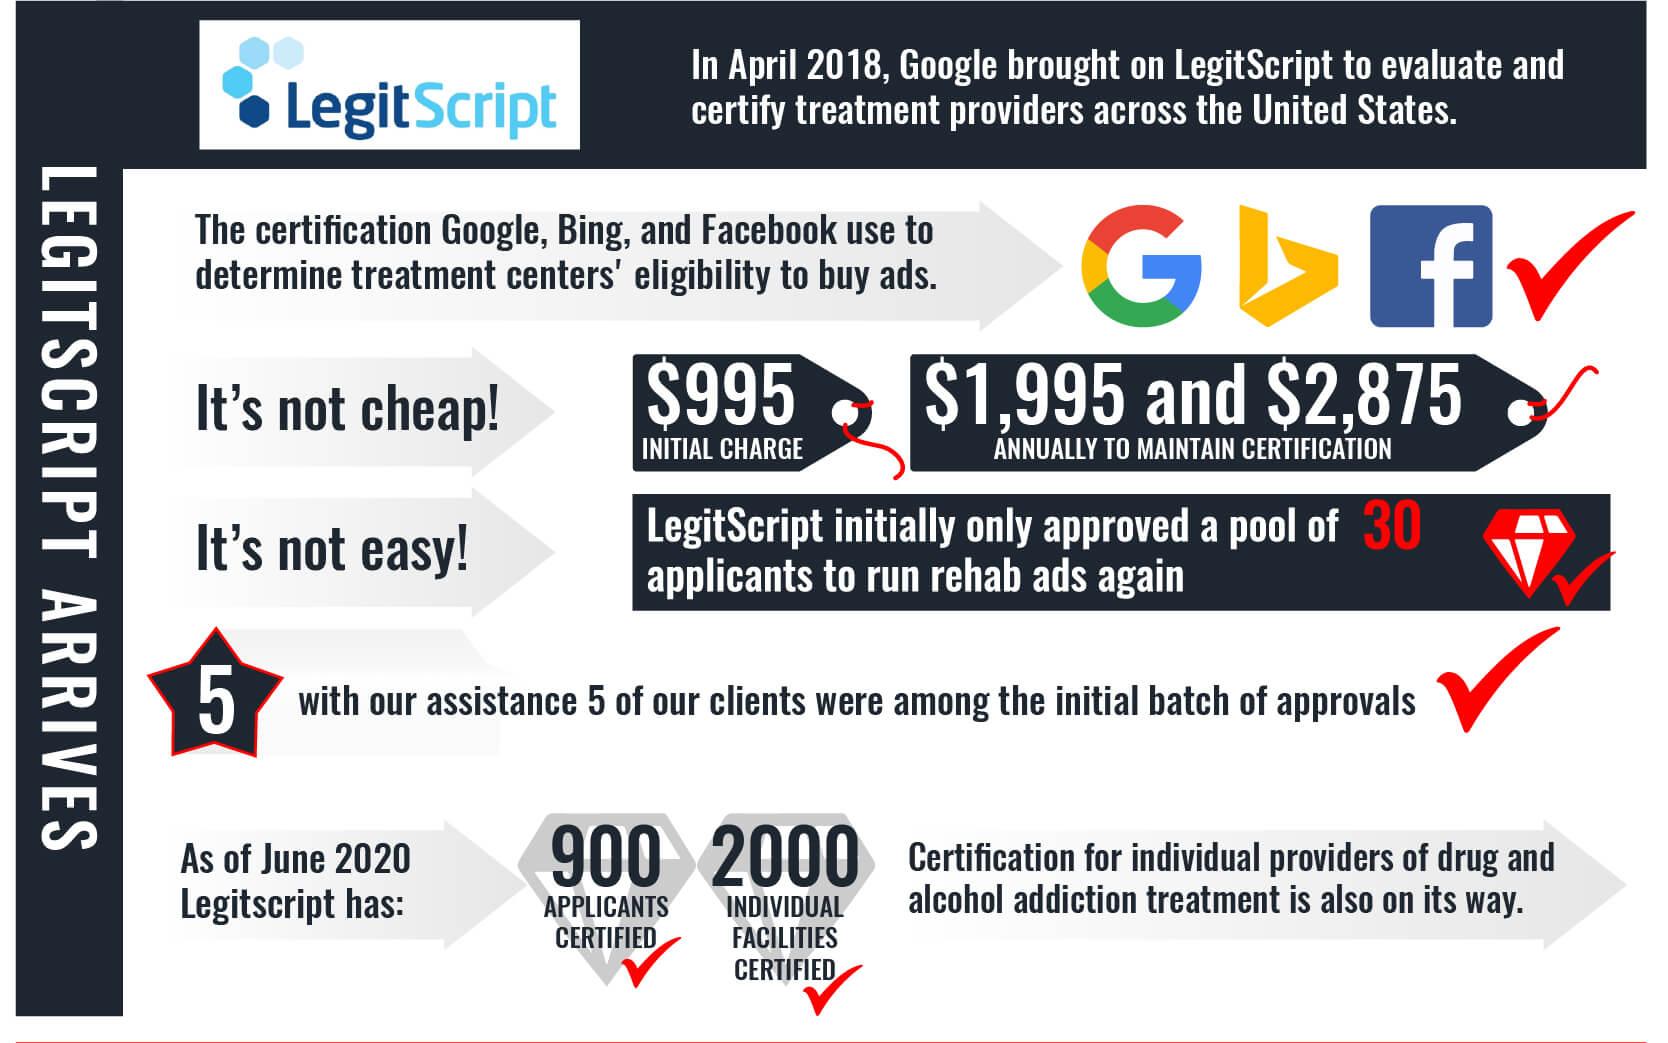 LegitScript Certification for Addiction Treatment